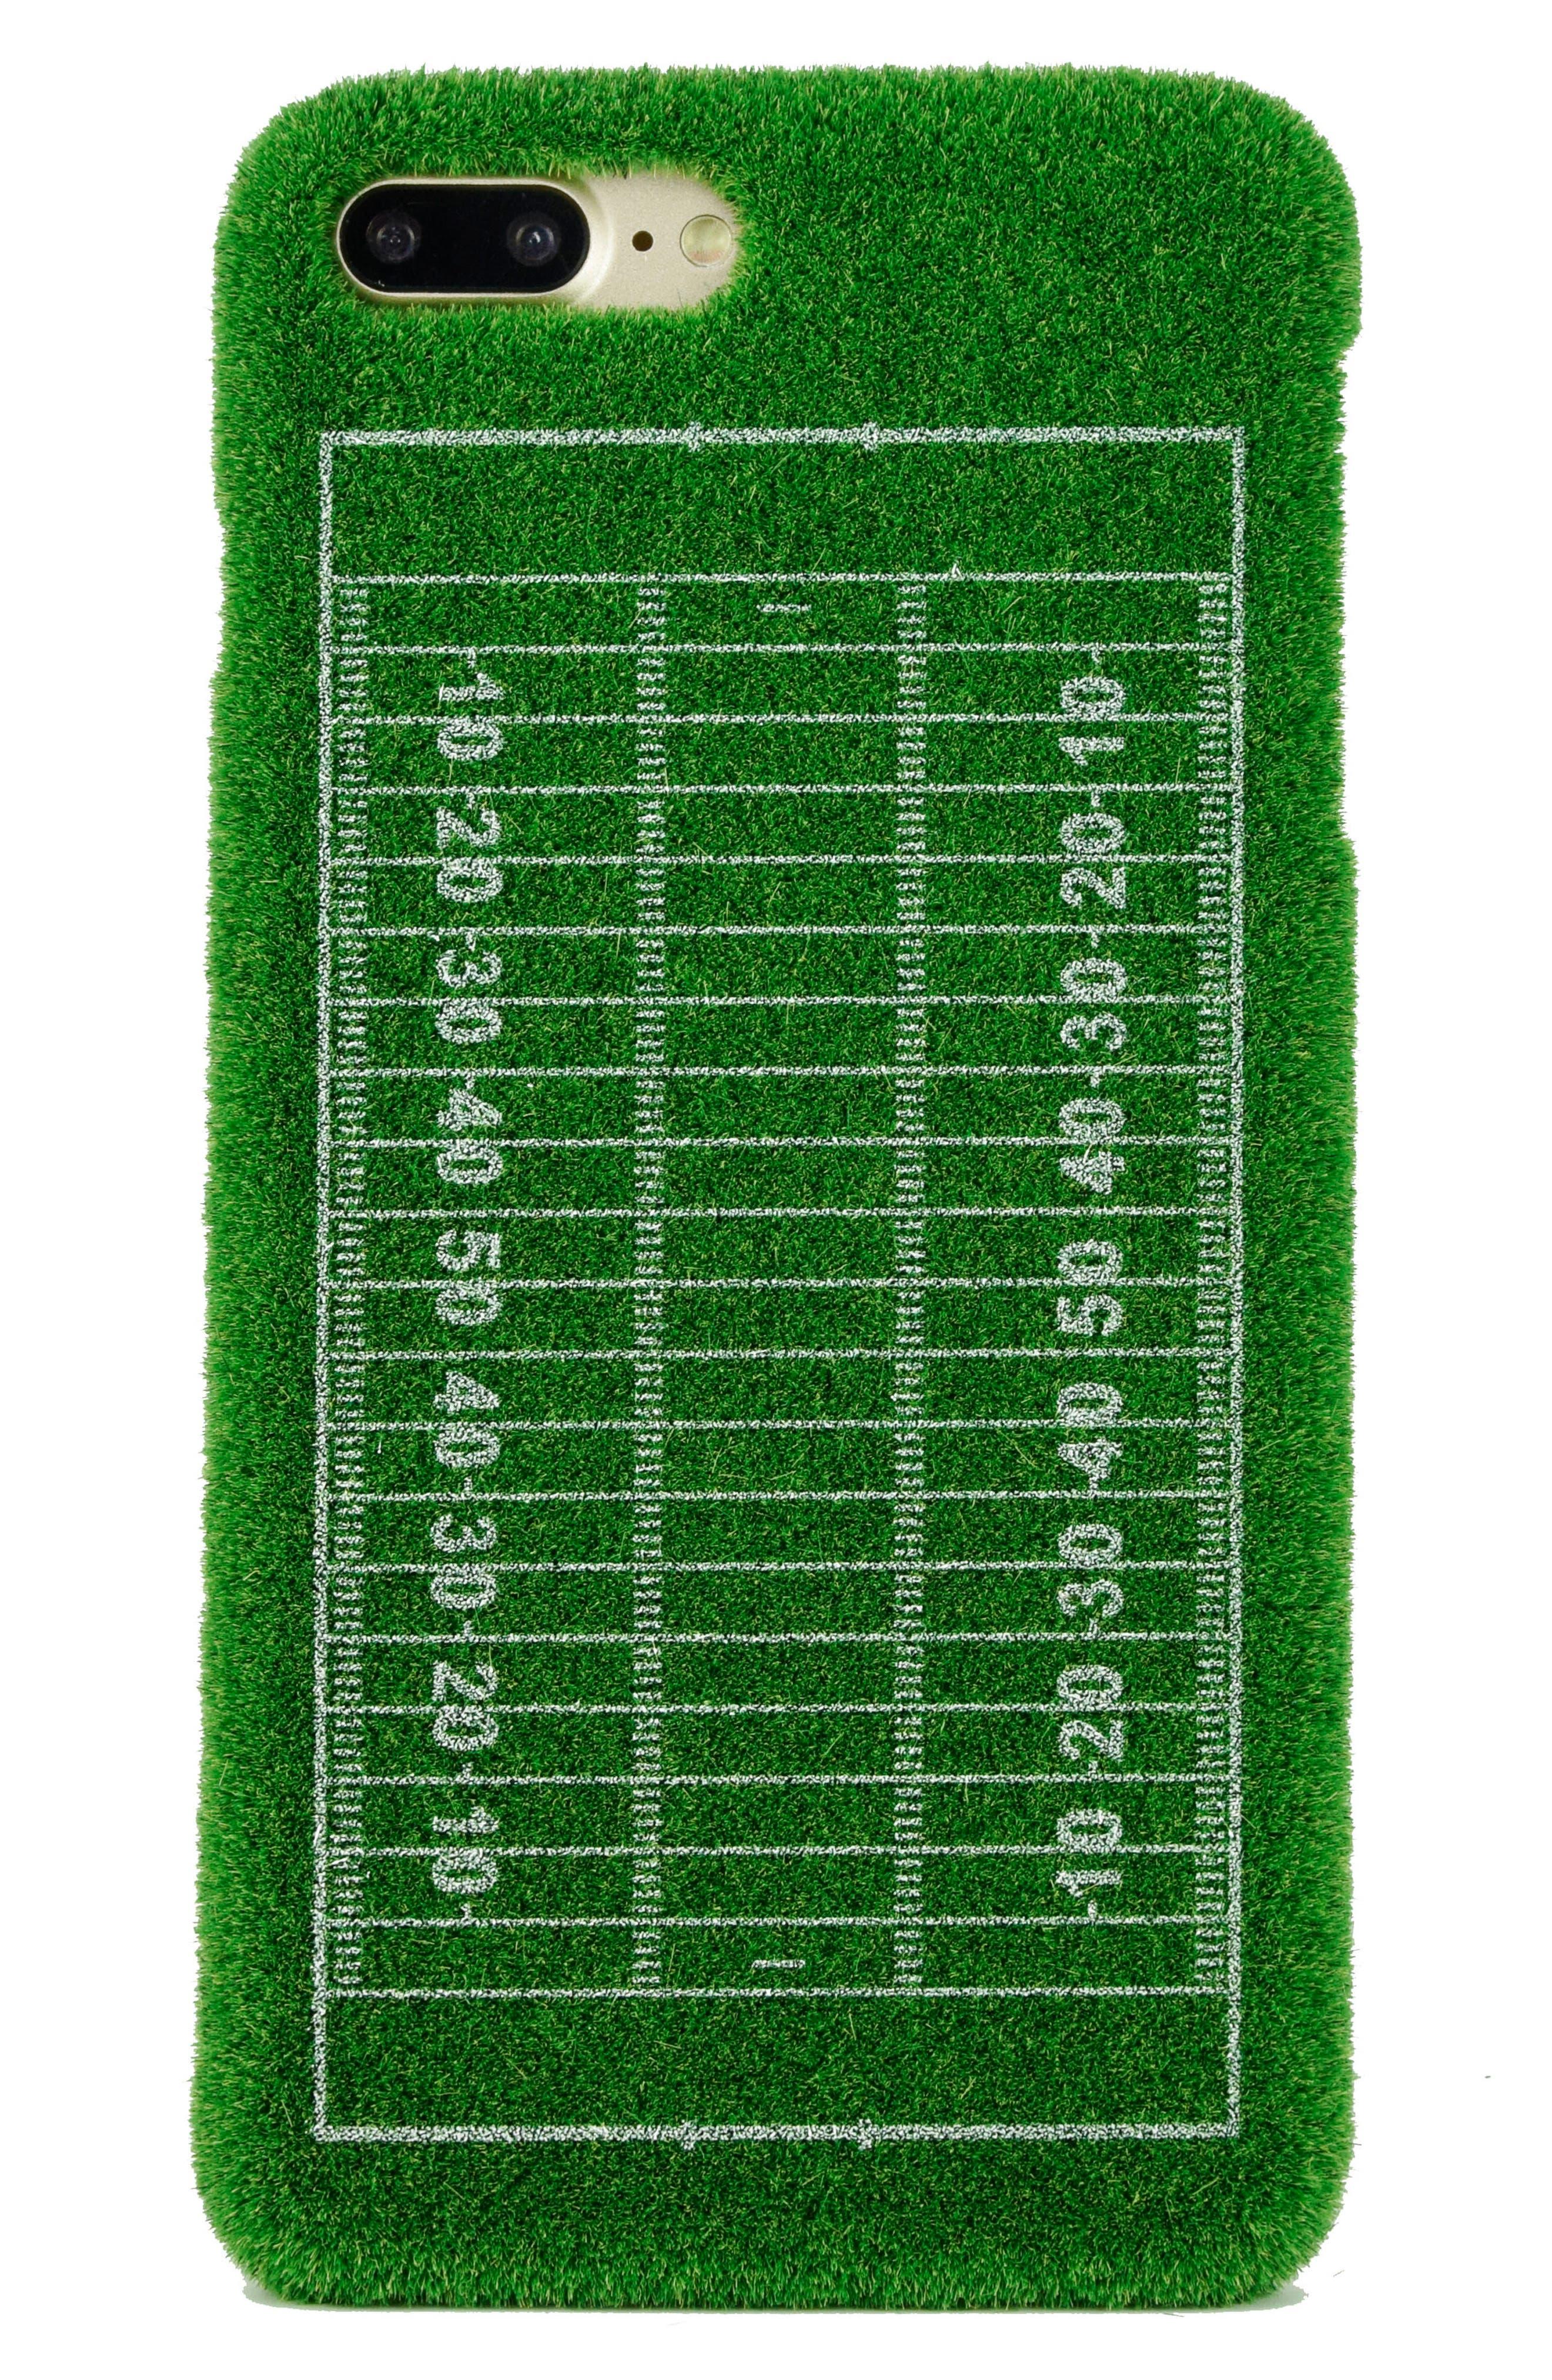 Main Image - Shibaful Super Bowl Portable Park iPhone 7 & iPhone 7 Plus Case